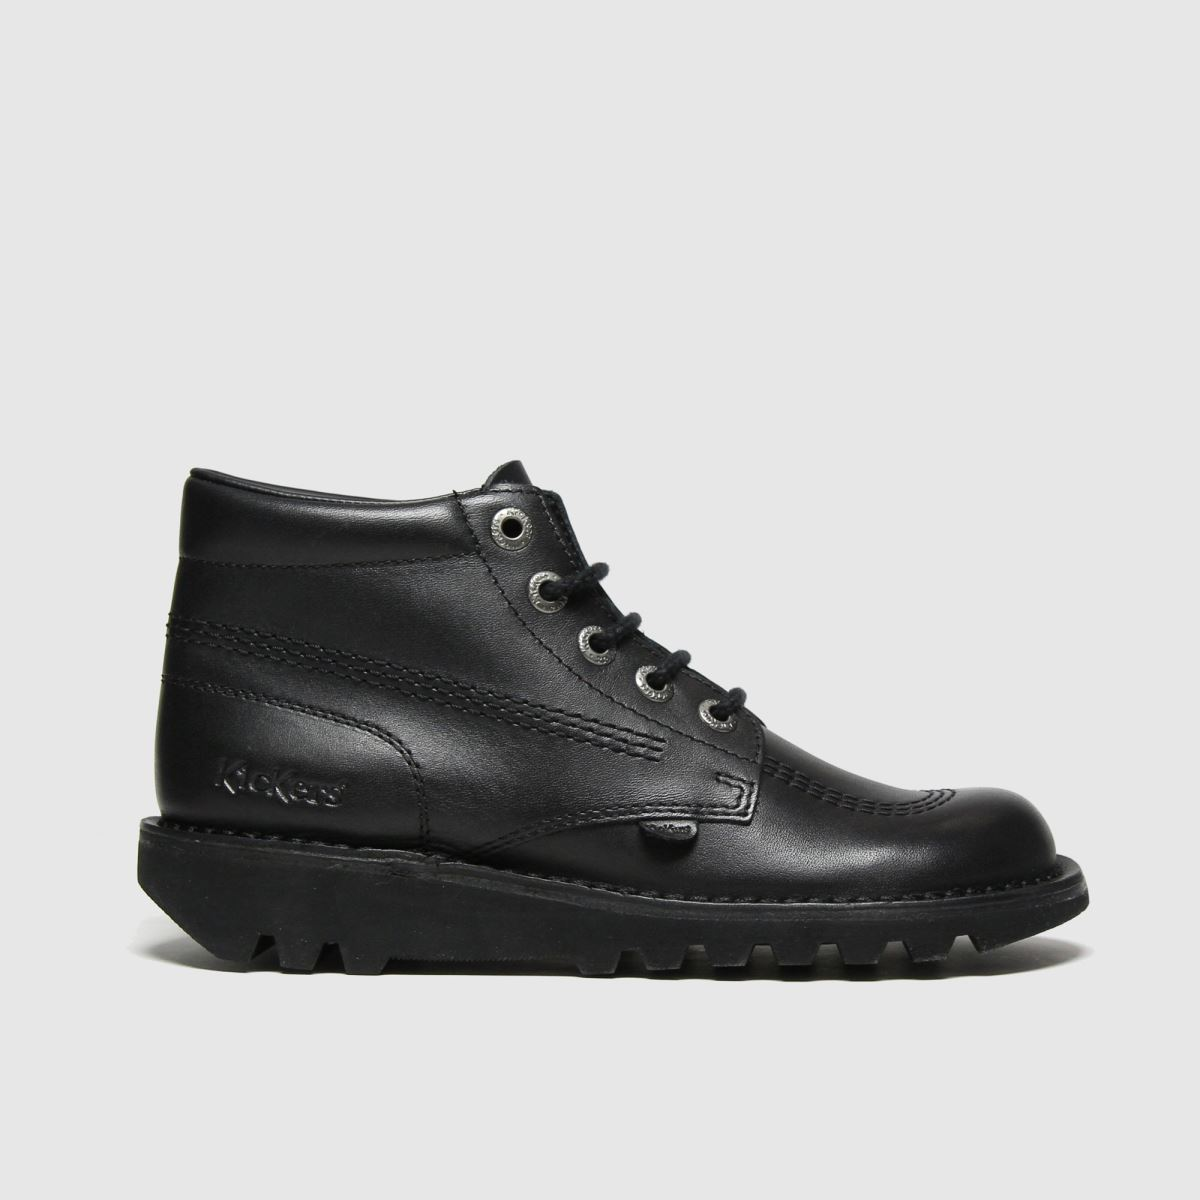 Kickers Black Kick Hi Mono Boots